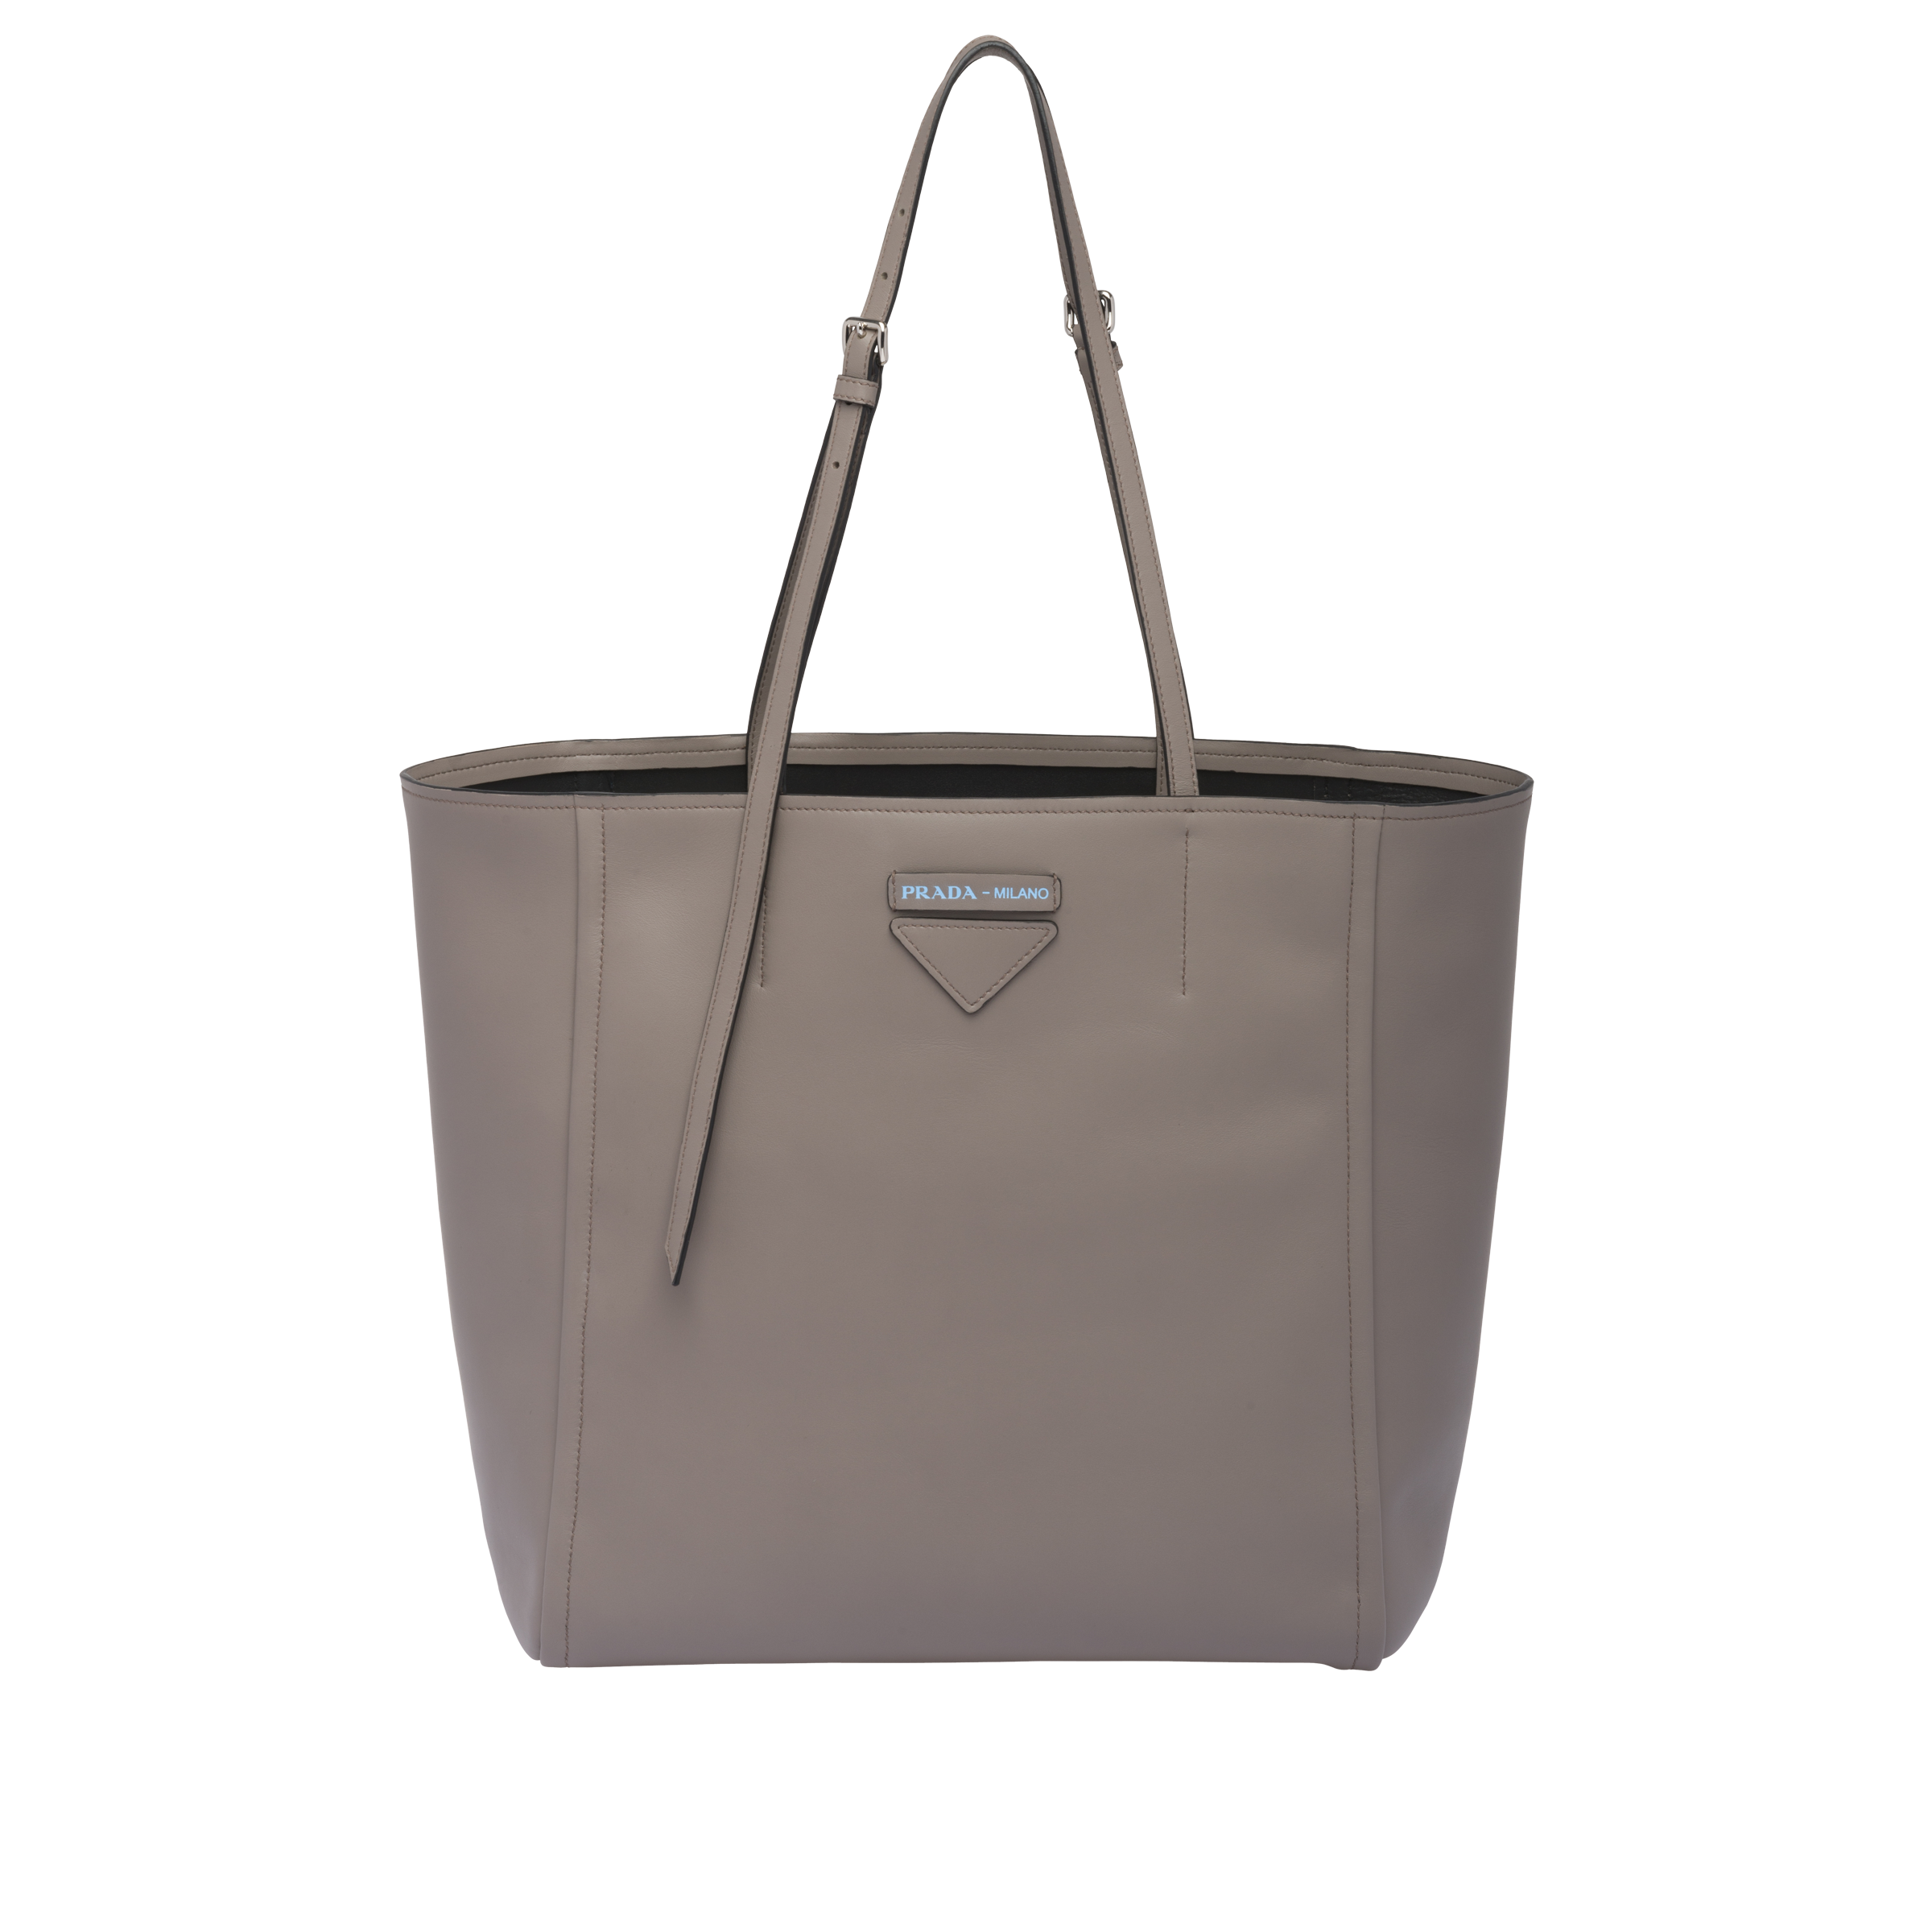 784bb42c4967c0 Prada Concept Medium leather tote | Prada - 1BG208_2B2J_F0LH7_V_OOO